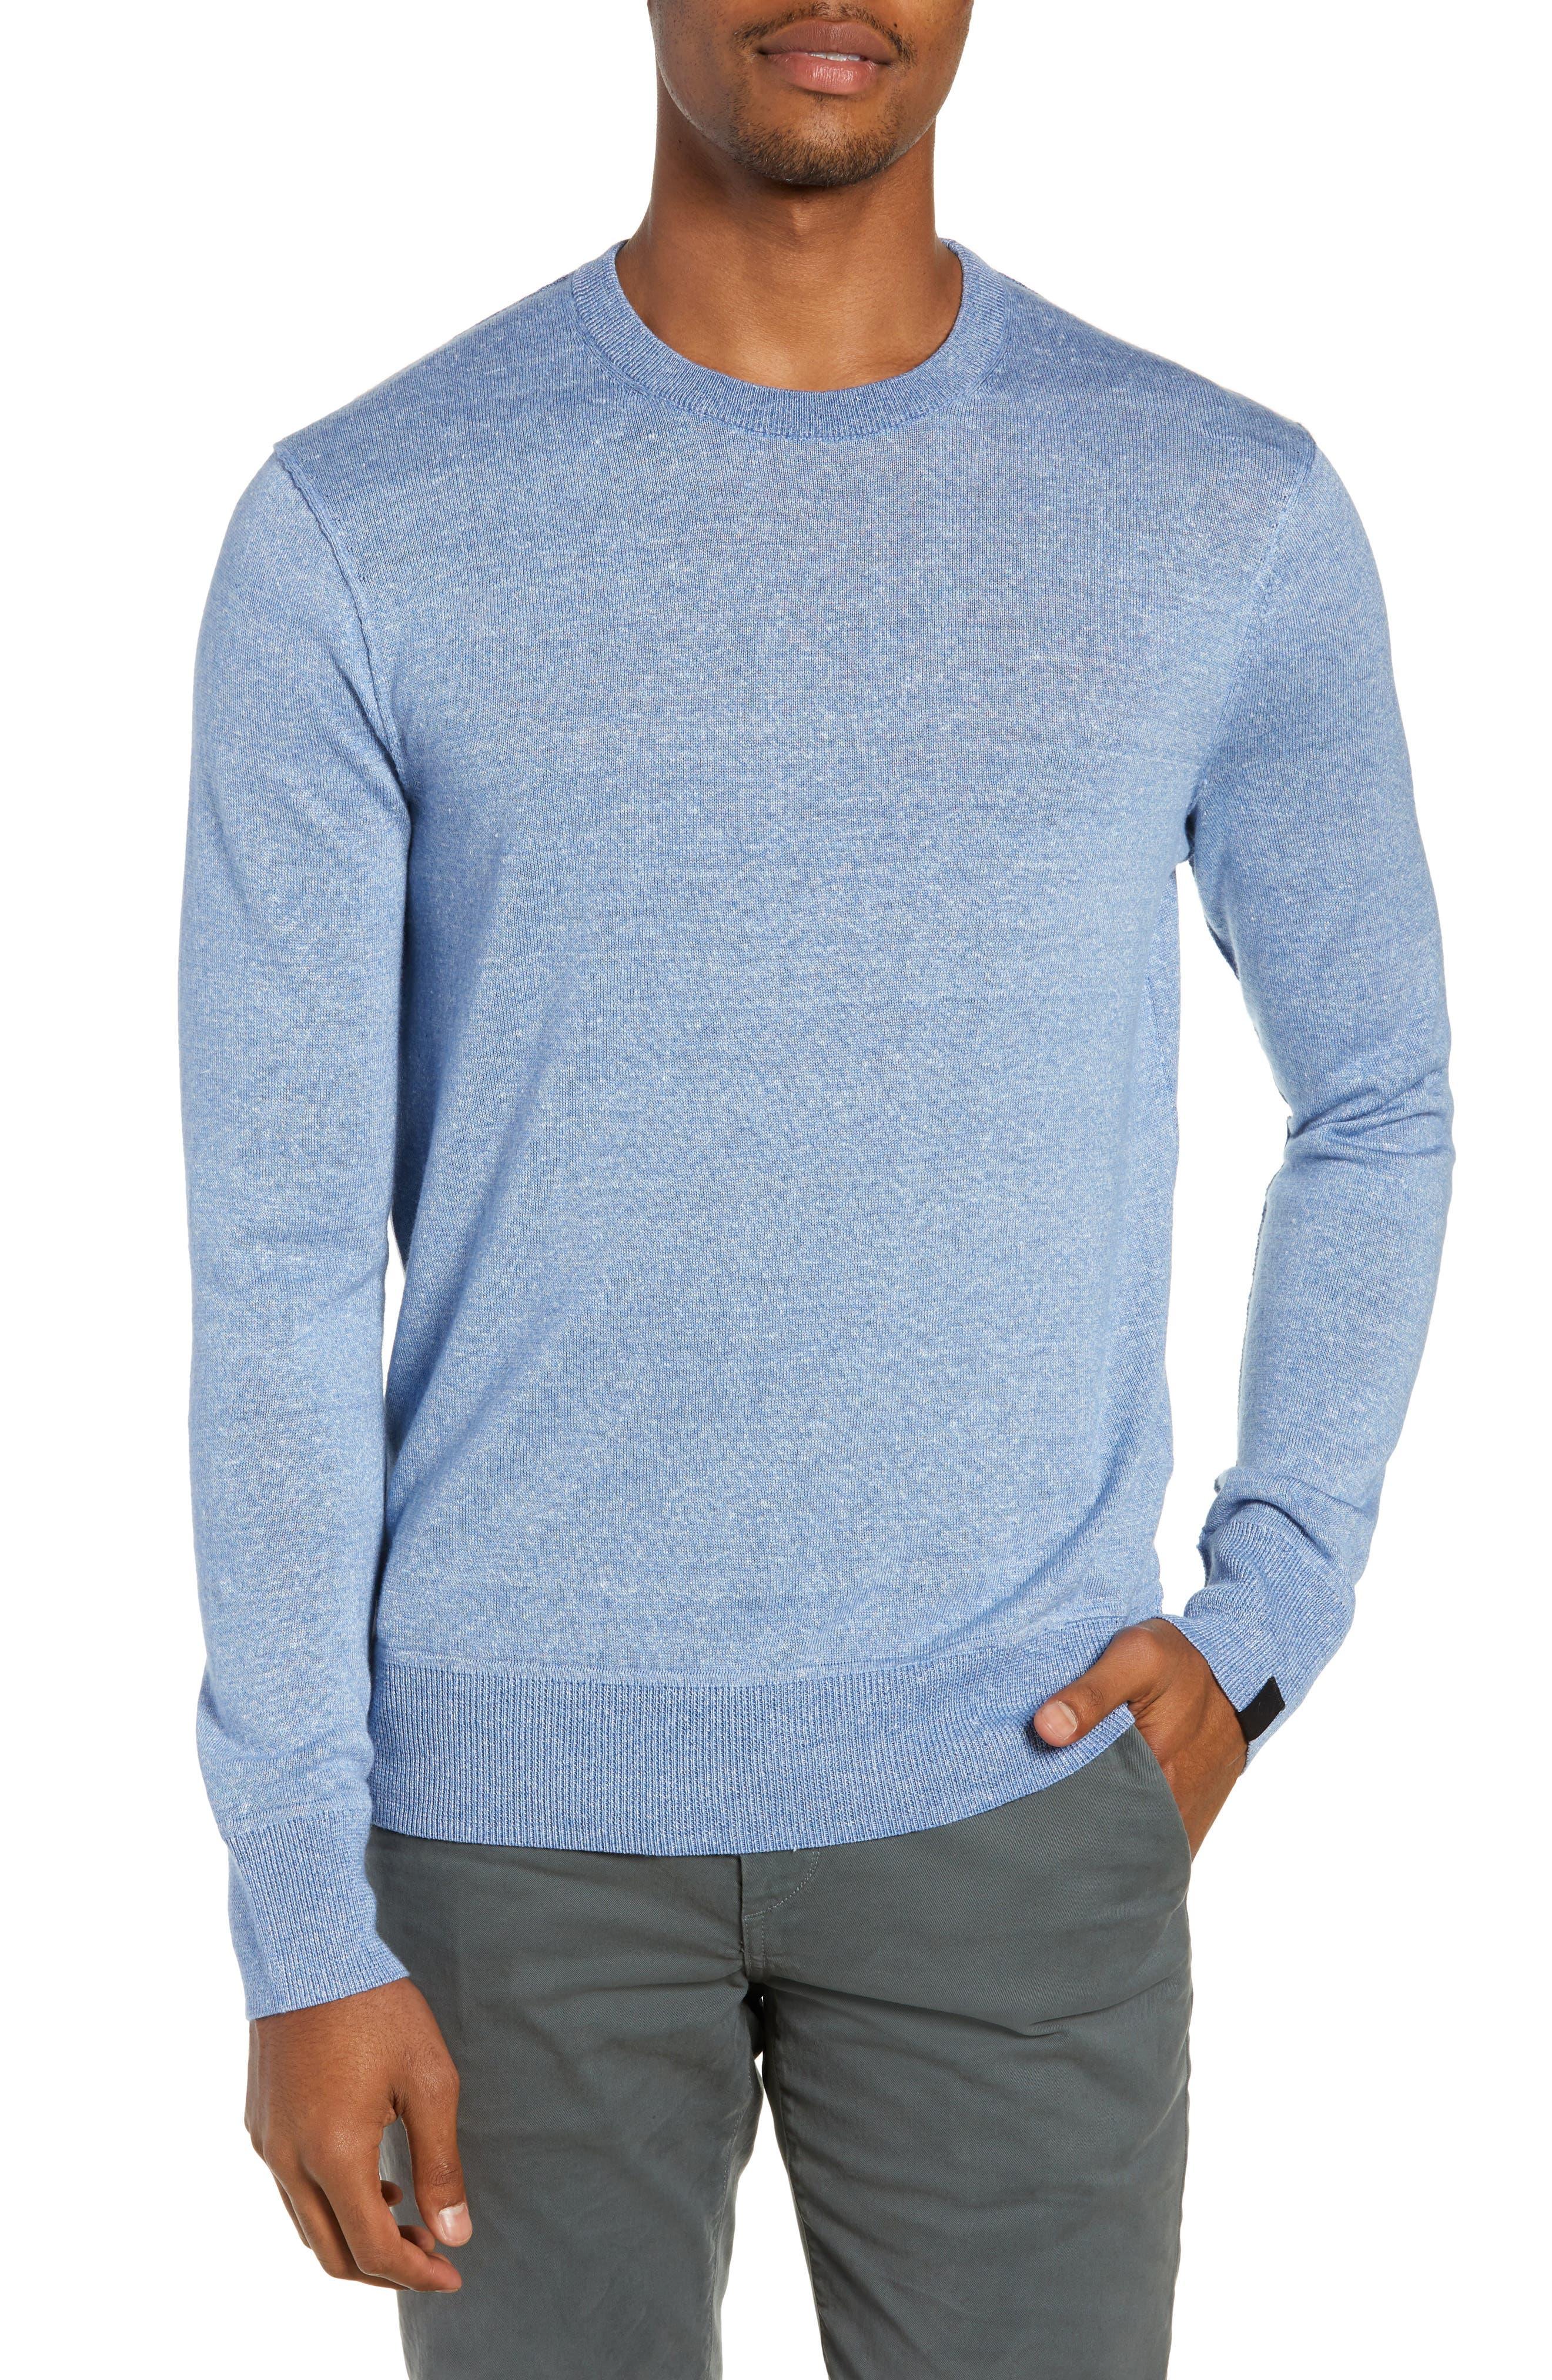 RAG & BONE Dean Slim Fit Crewneck Sweater, Main, color, 455